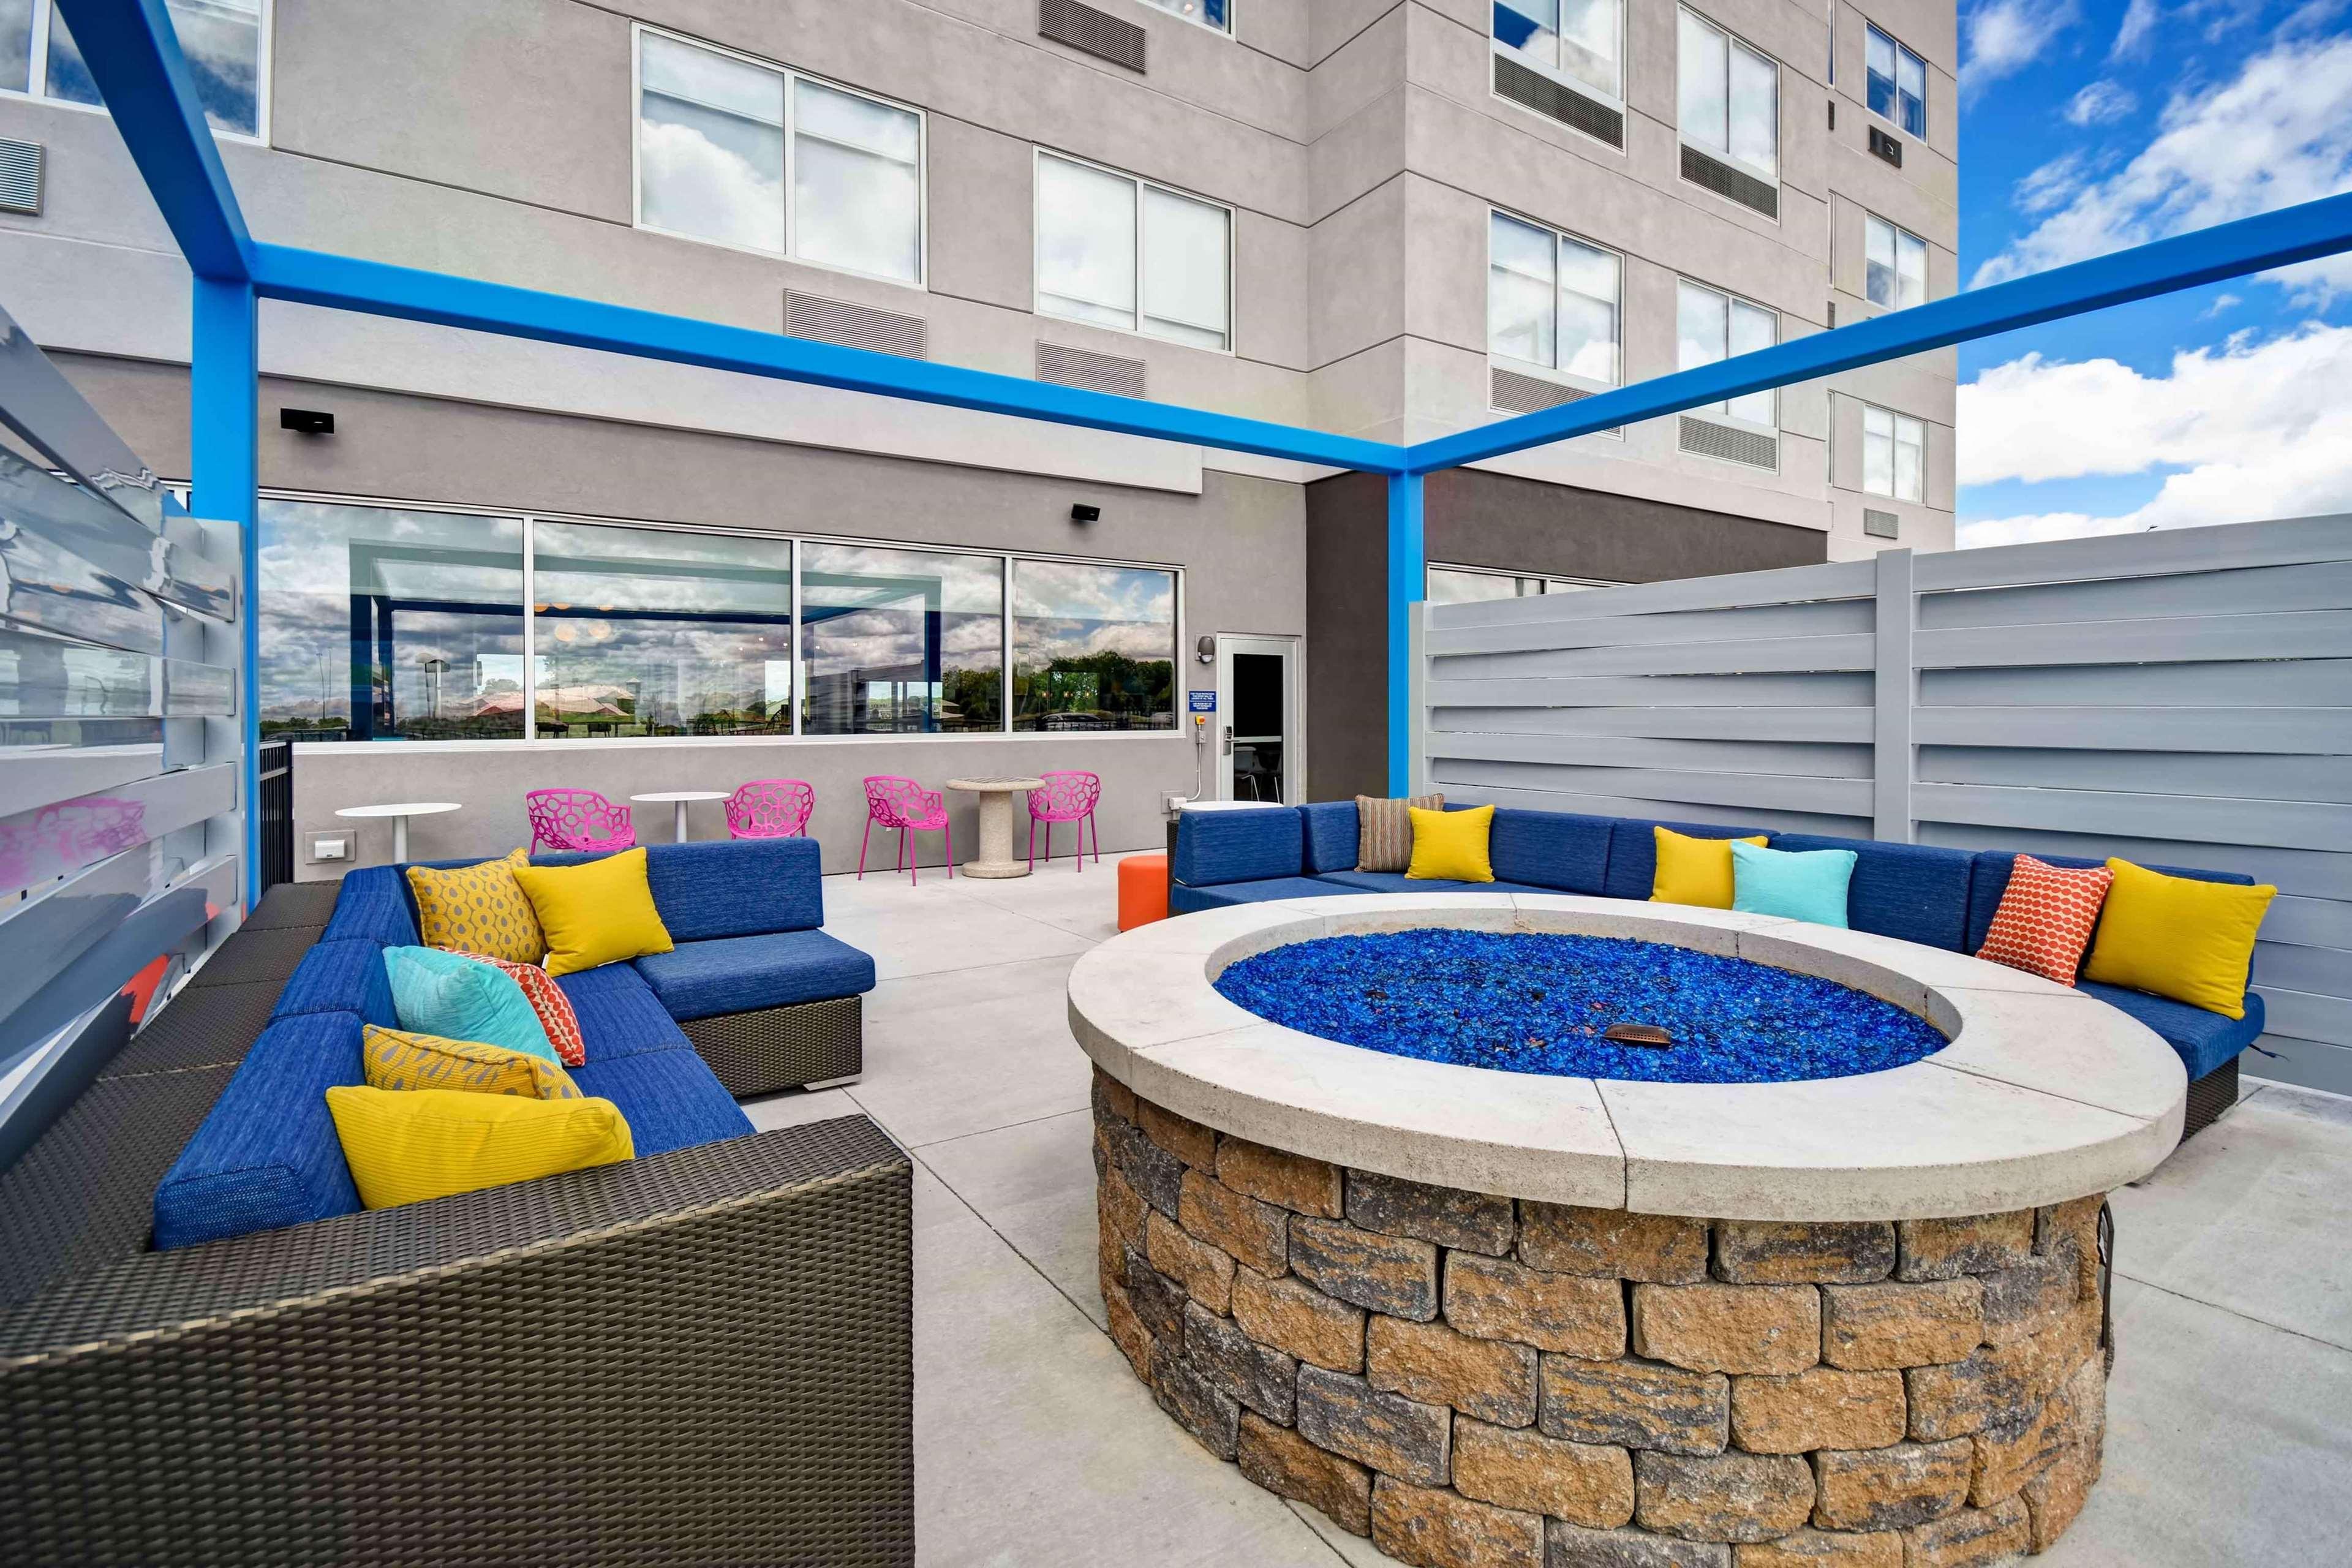 Tru by Hilton North Platte image 2